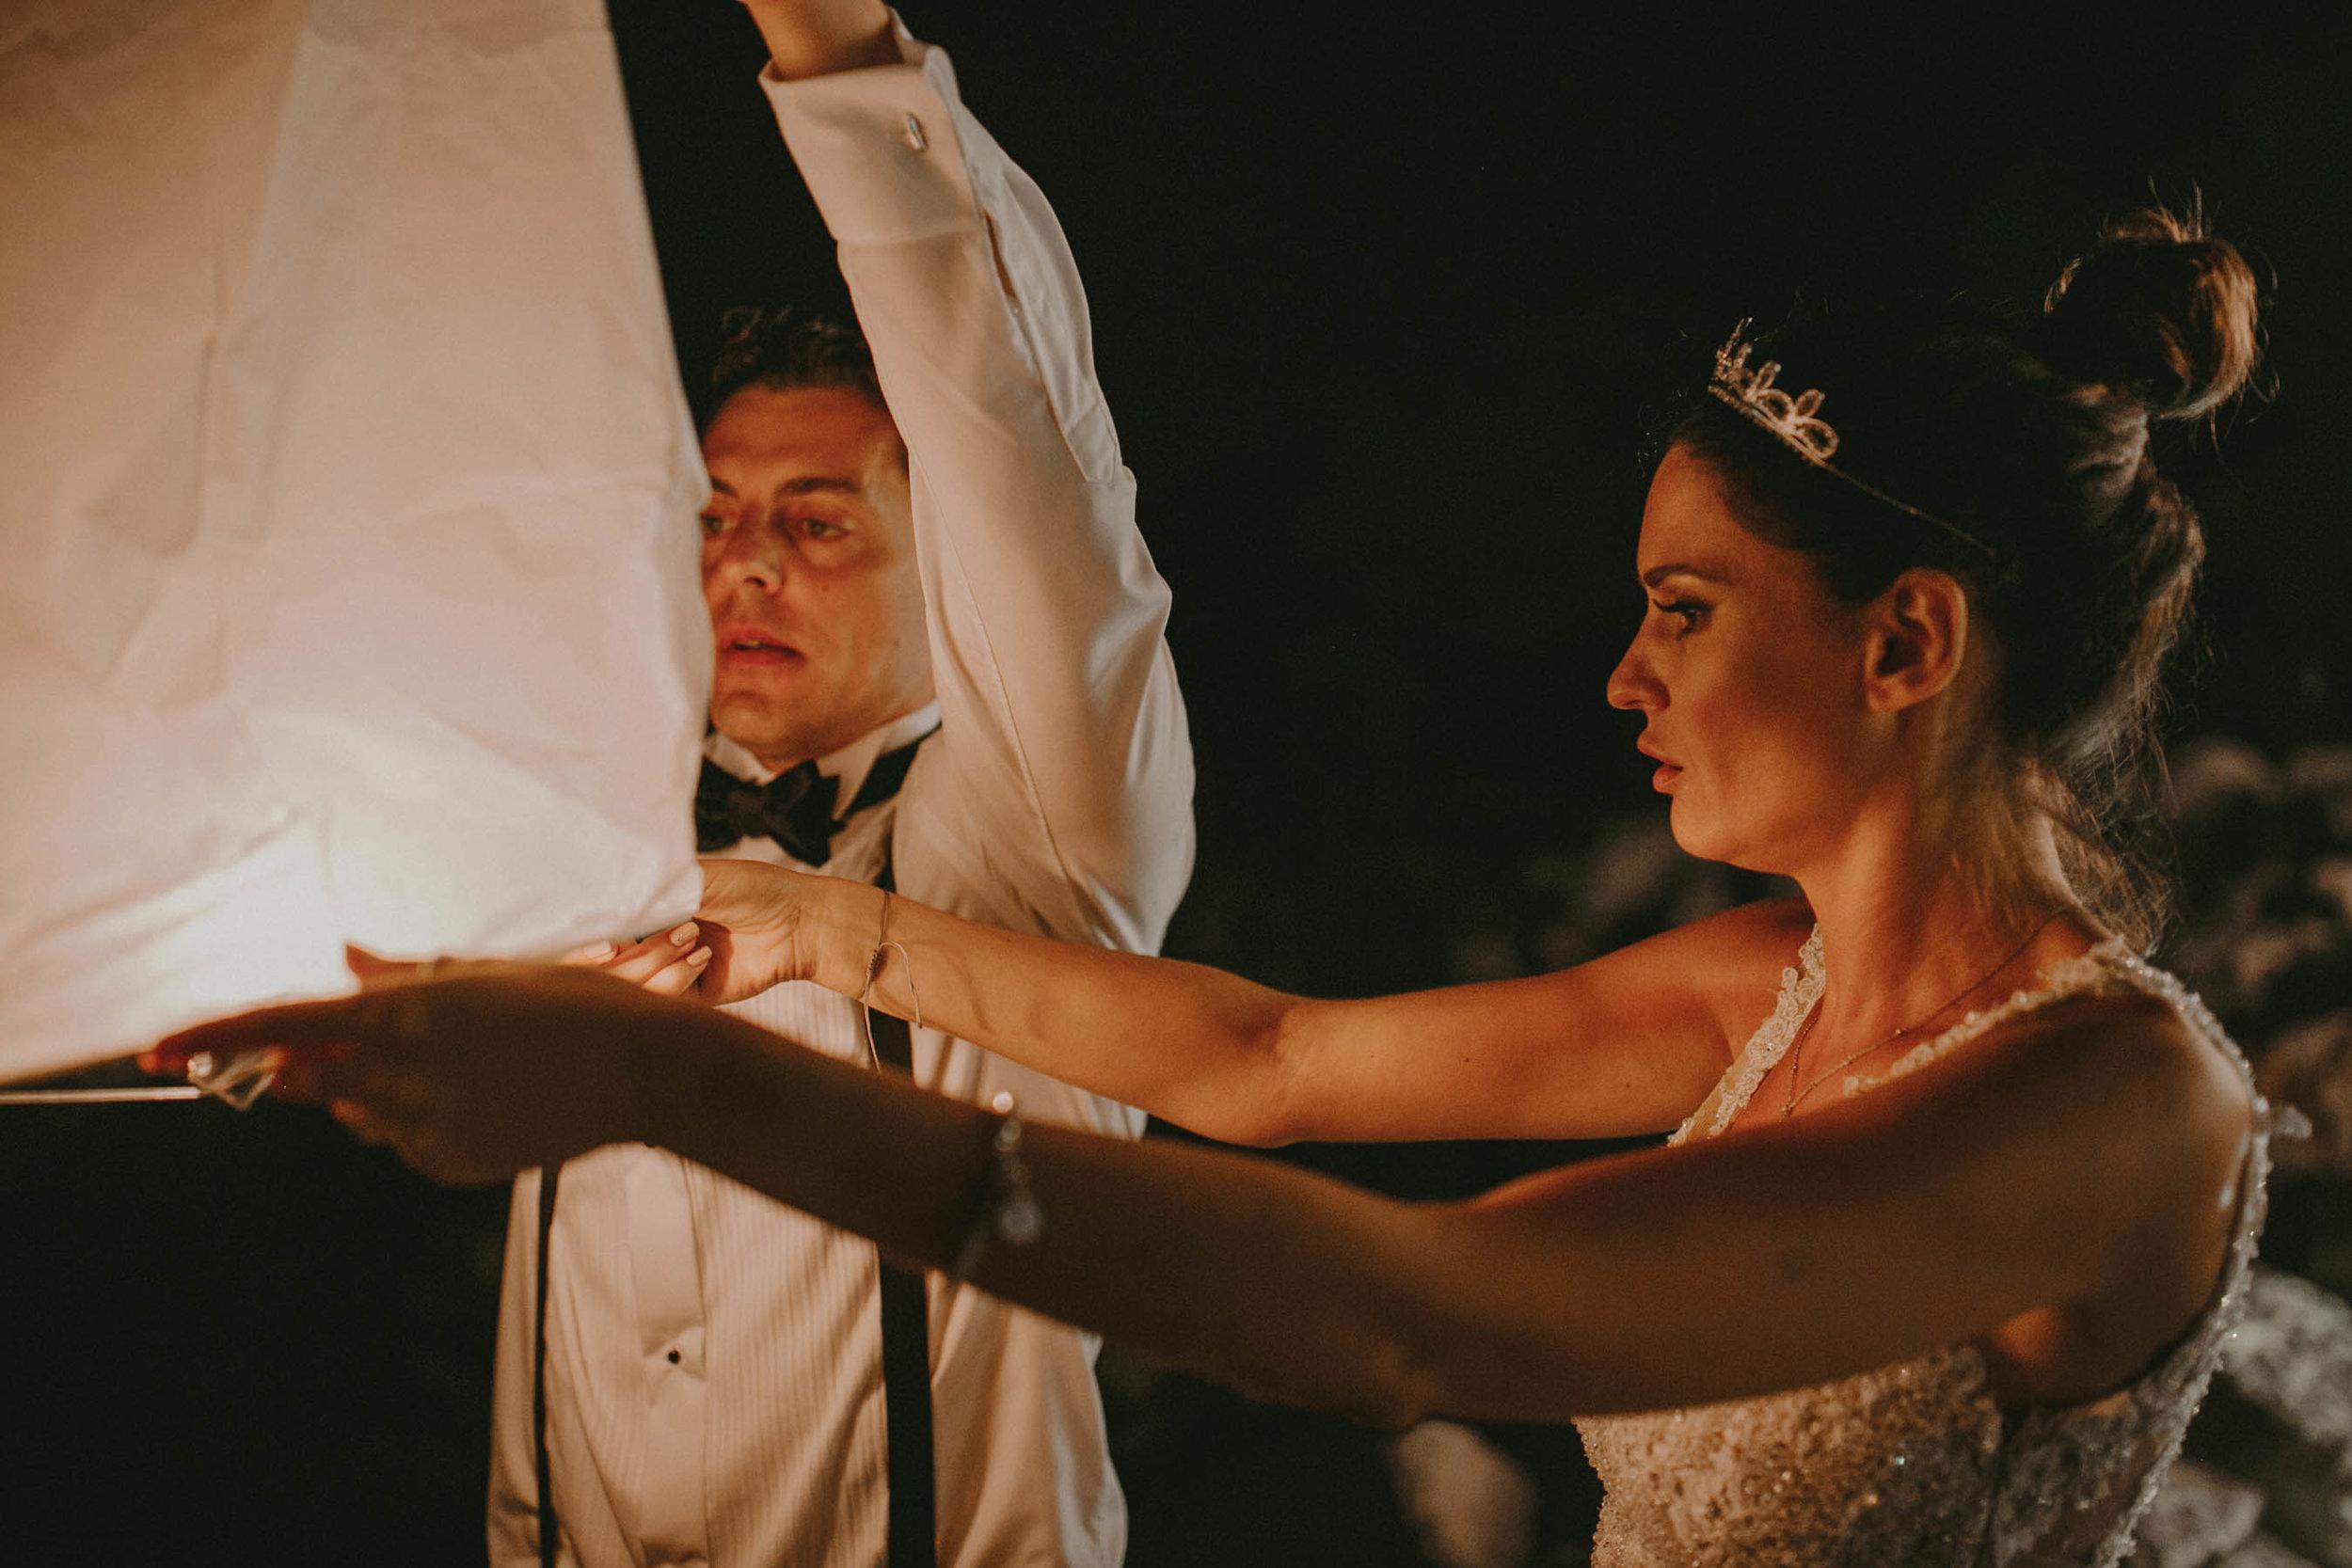 sylvia&dimitri-Wedding-Crvena_Luka-Croatia-136(0924).jpg